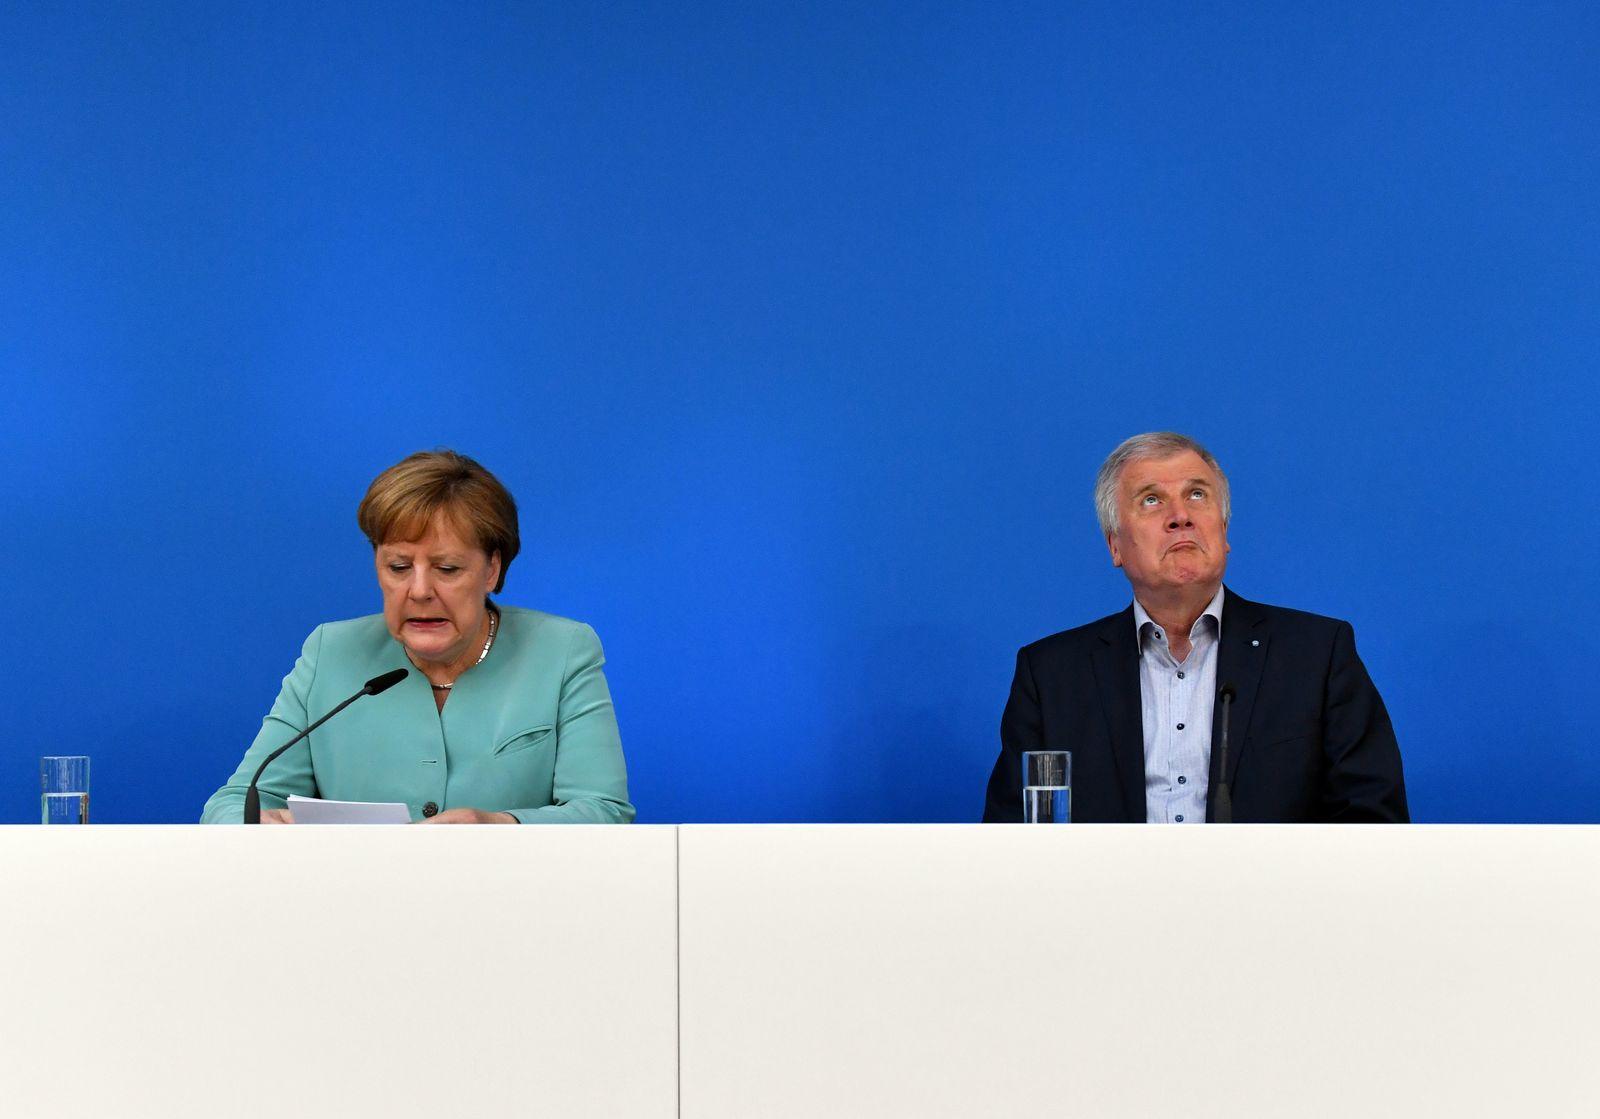 Angela Merkel / Horst Seehofer